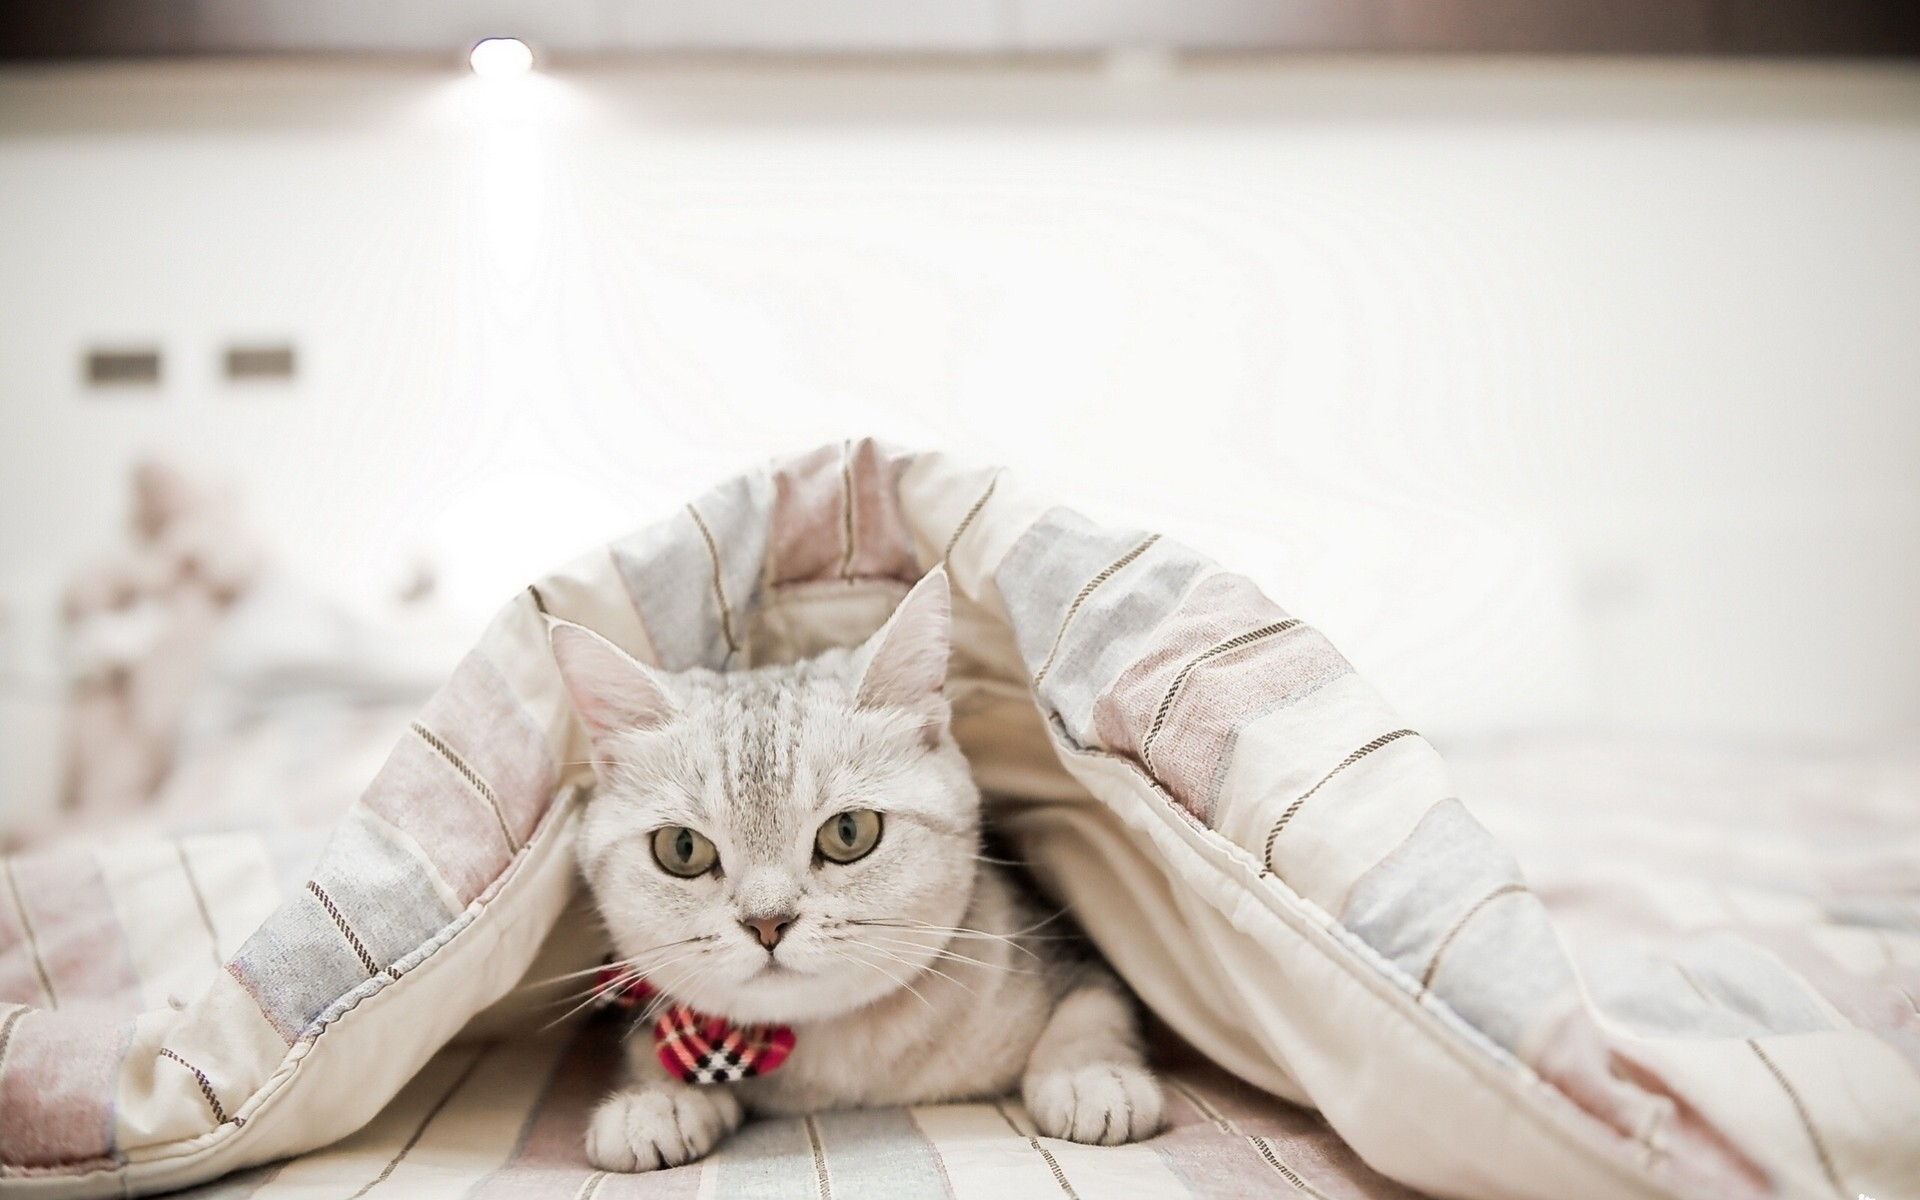 фото котенка под пледом максимальном